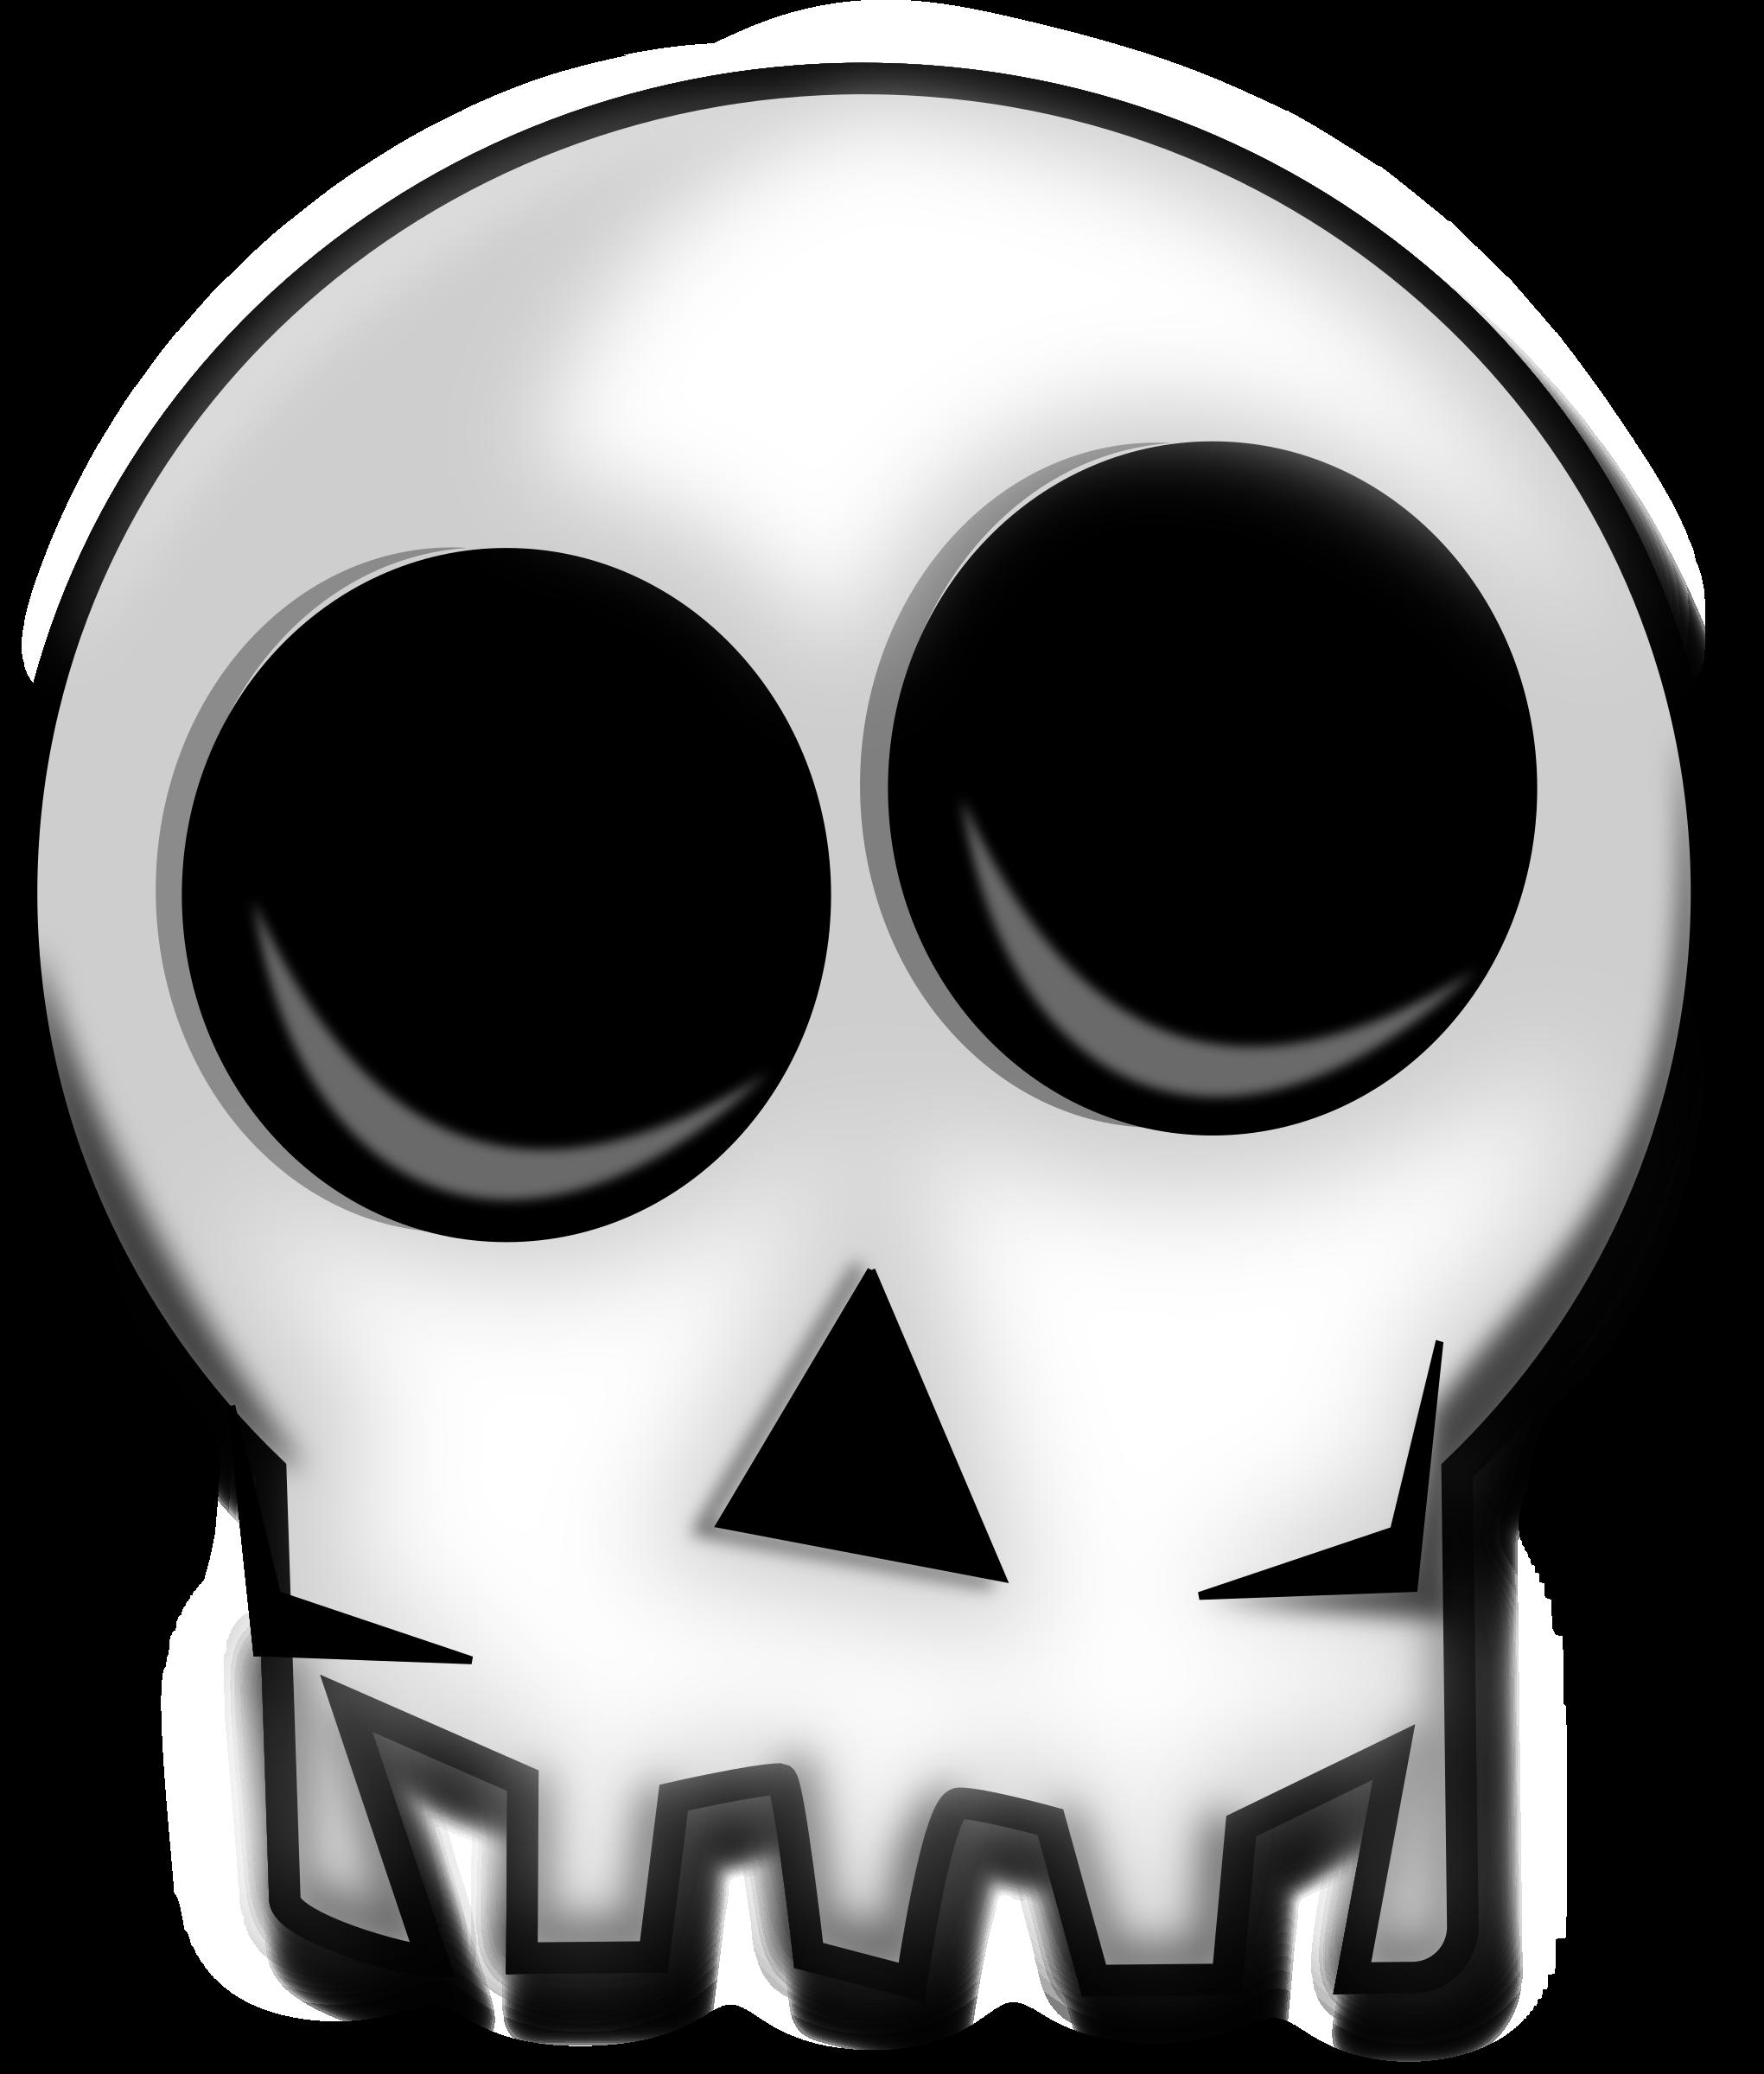 Feraliminal Skull Remix By Merlin2525 Simple Art Skull Art